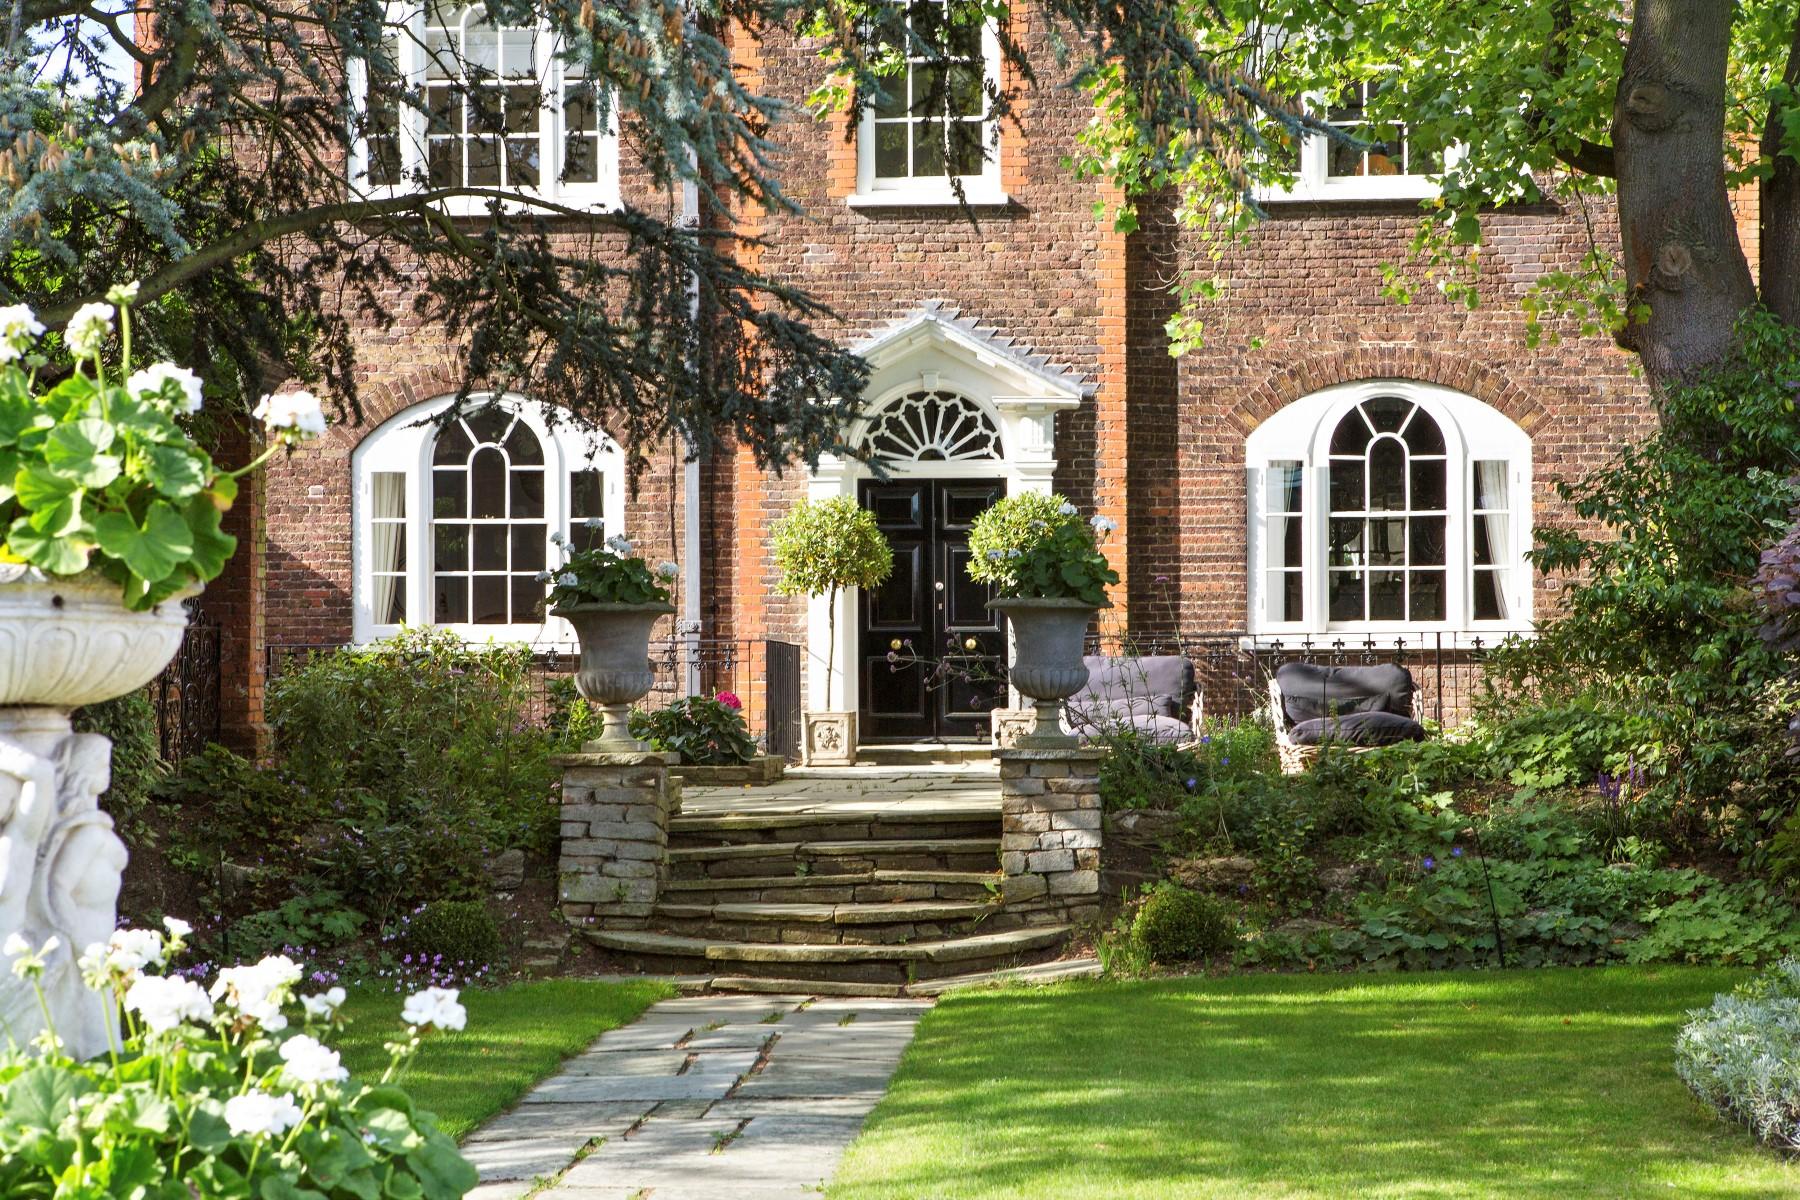 Casa Unifamiliar por un Venta en Historical Hampton Court Hampton Court Road East Molesey, Inglaterra KT89DA Reino Unido